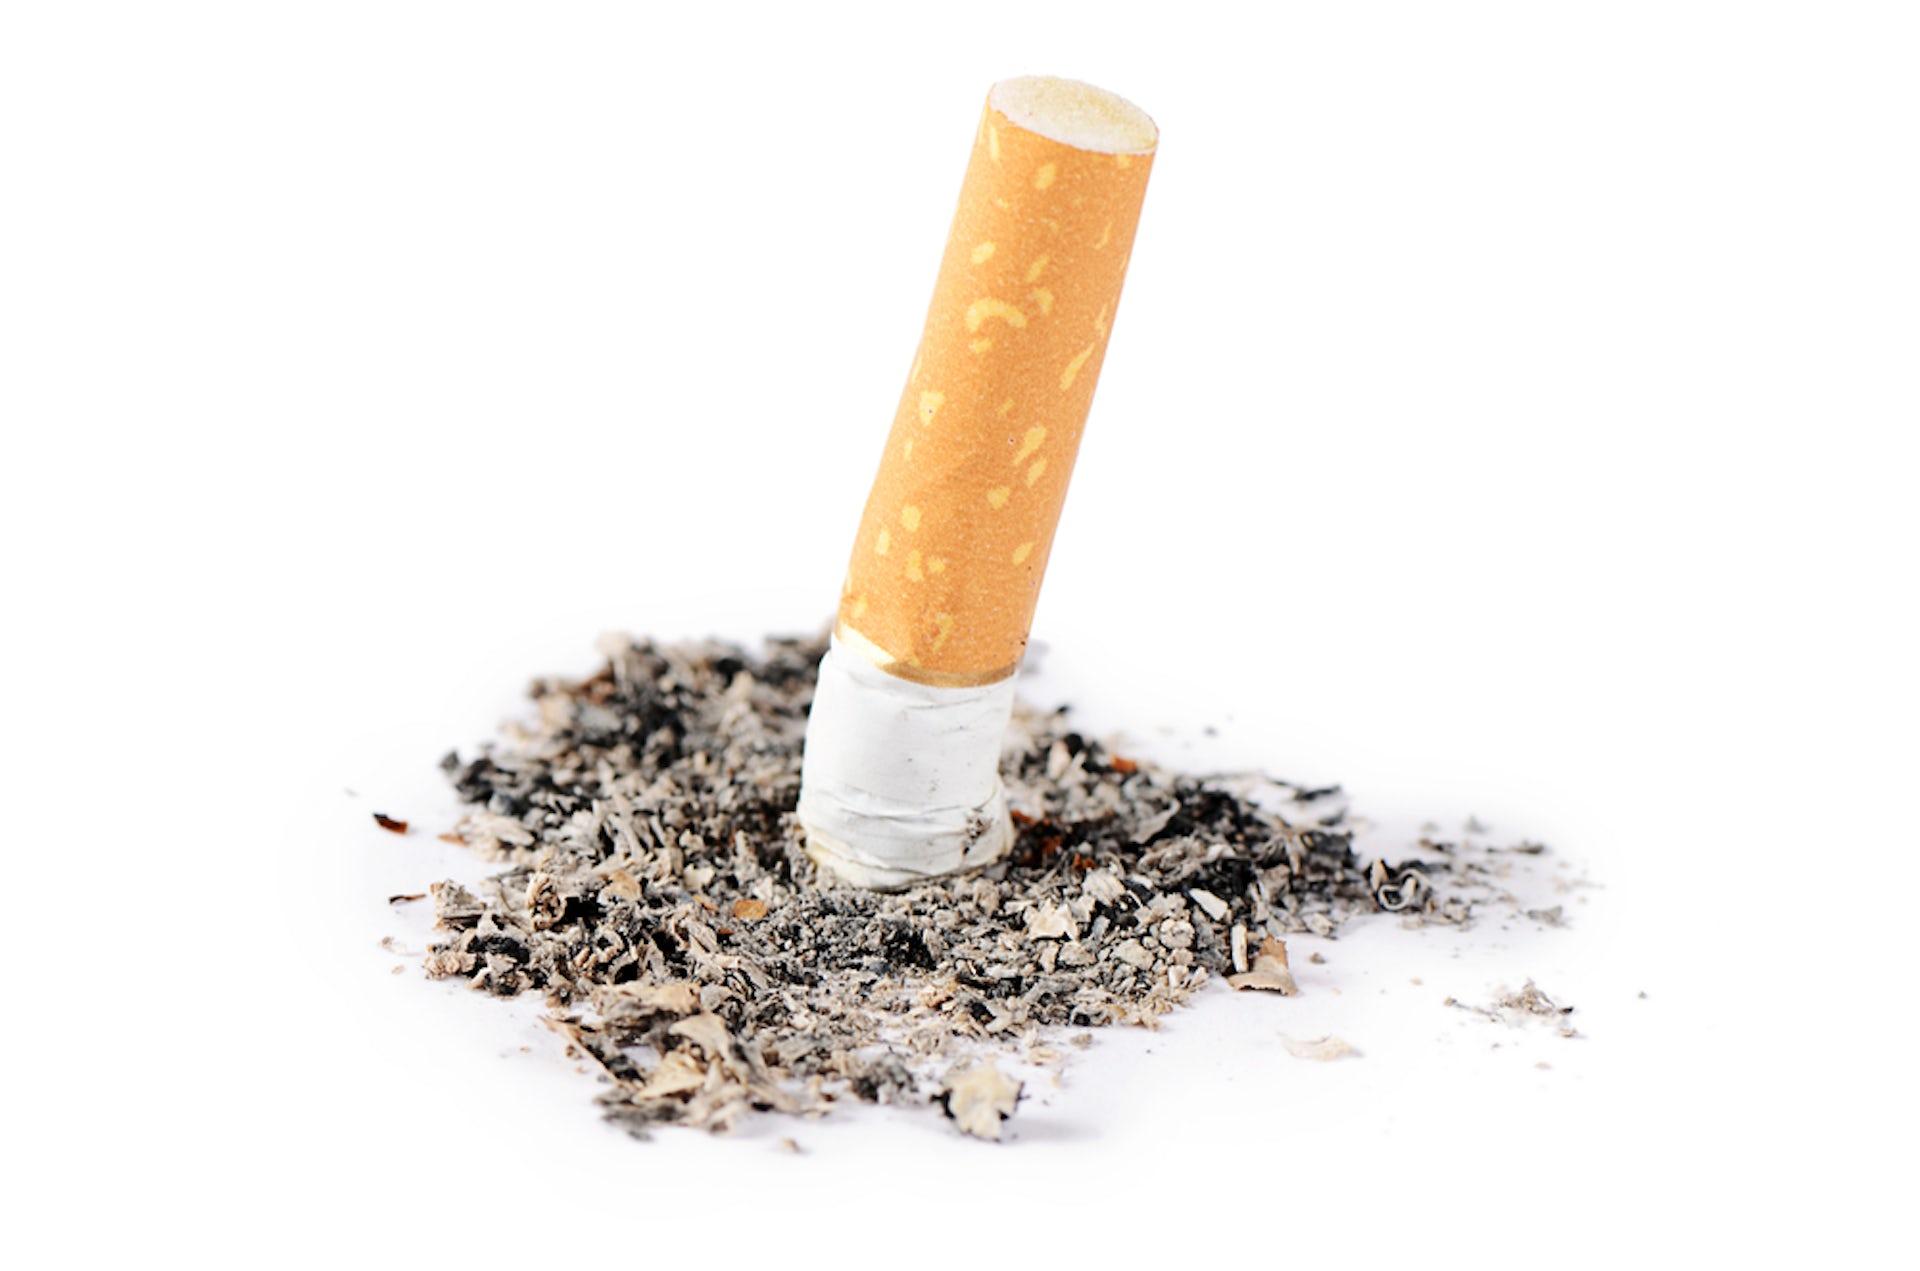 Smoking Cessation Articles